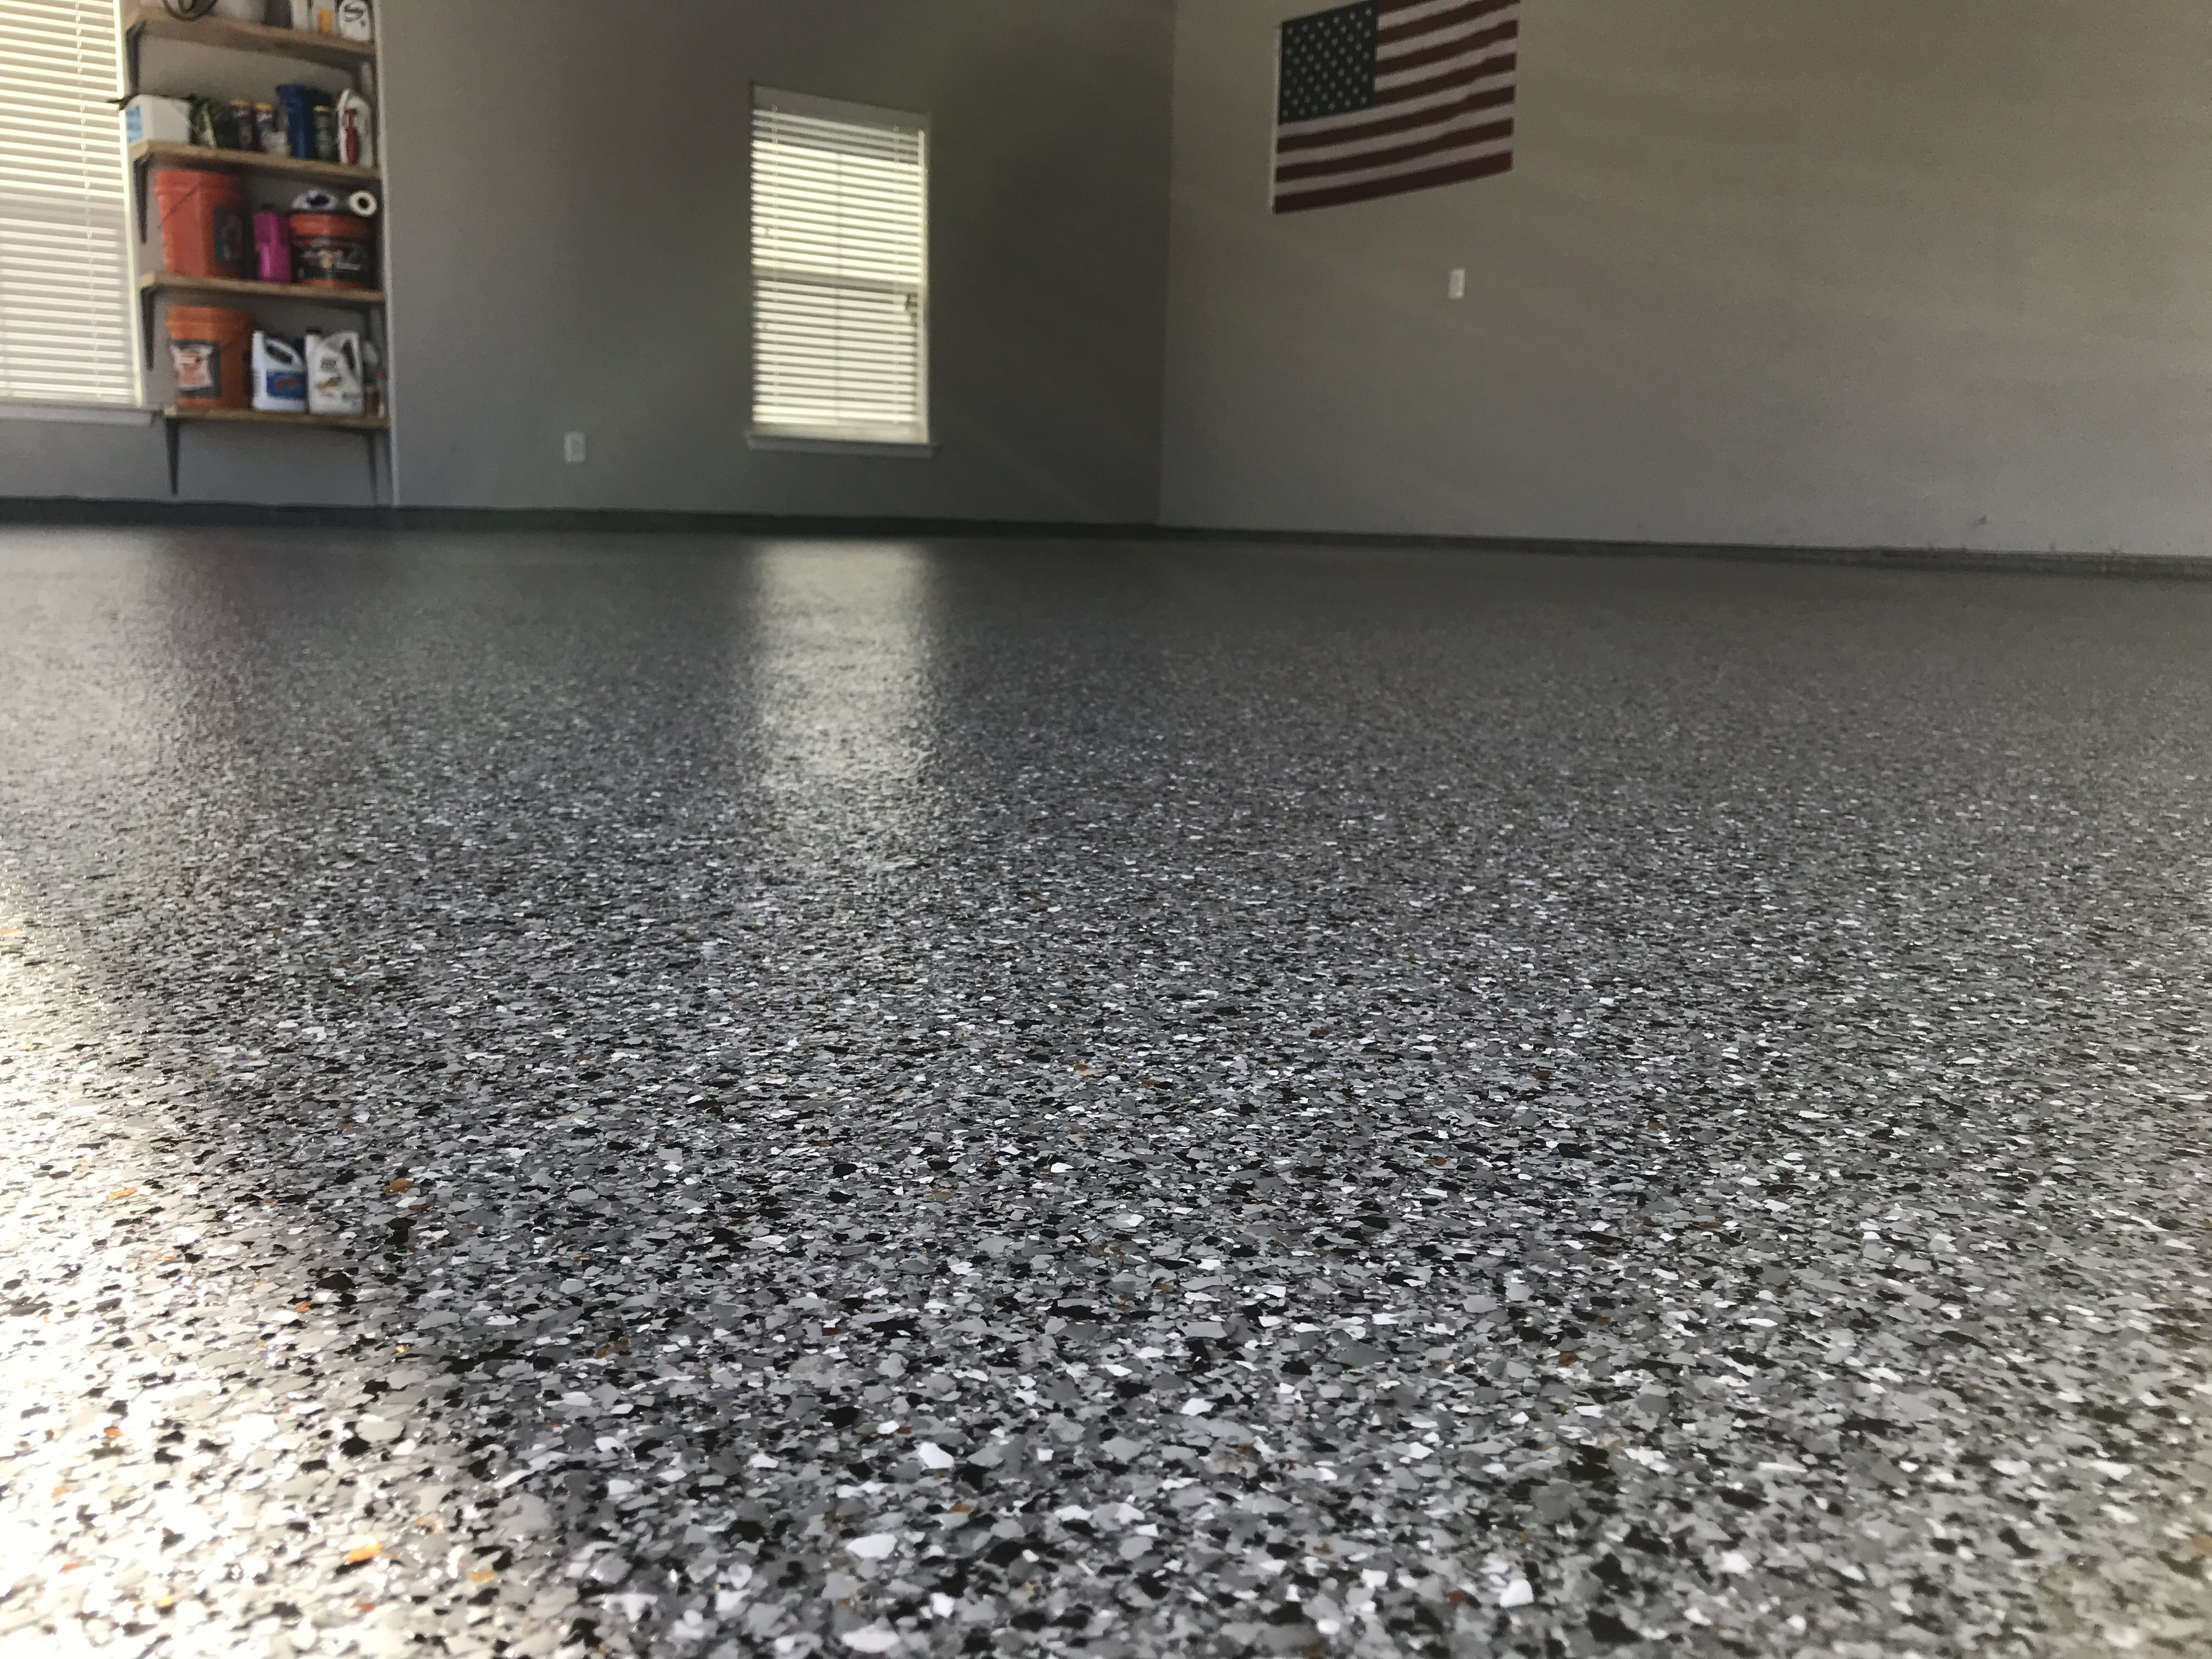 Granite Marble W White Polyaspartic Garagefloors Customfloor Customgarage Coating Floorpaint E Flooring Contractor Garage Floor Garage Floor Coatings